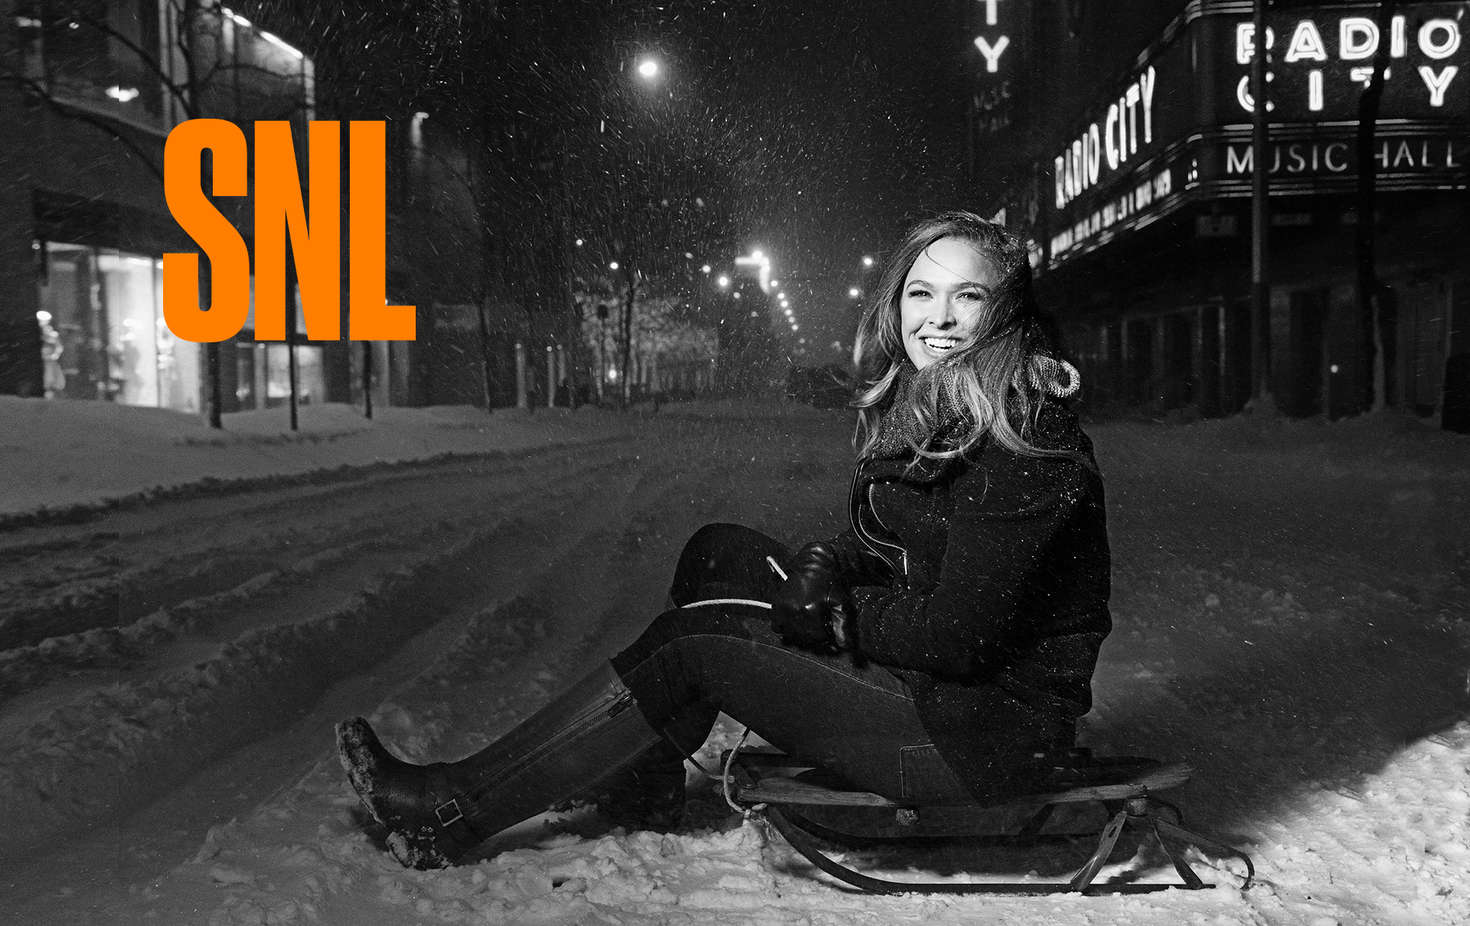 Ronda Rousey 2016 : Ronda Rousey: Saturday Night Live Photoshoot 2016 -03